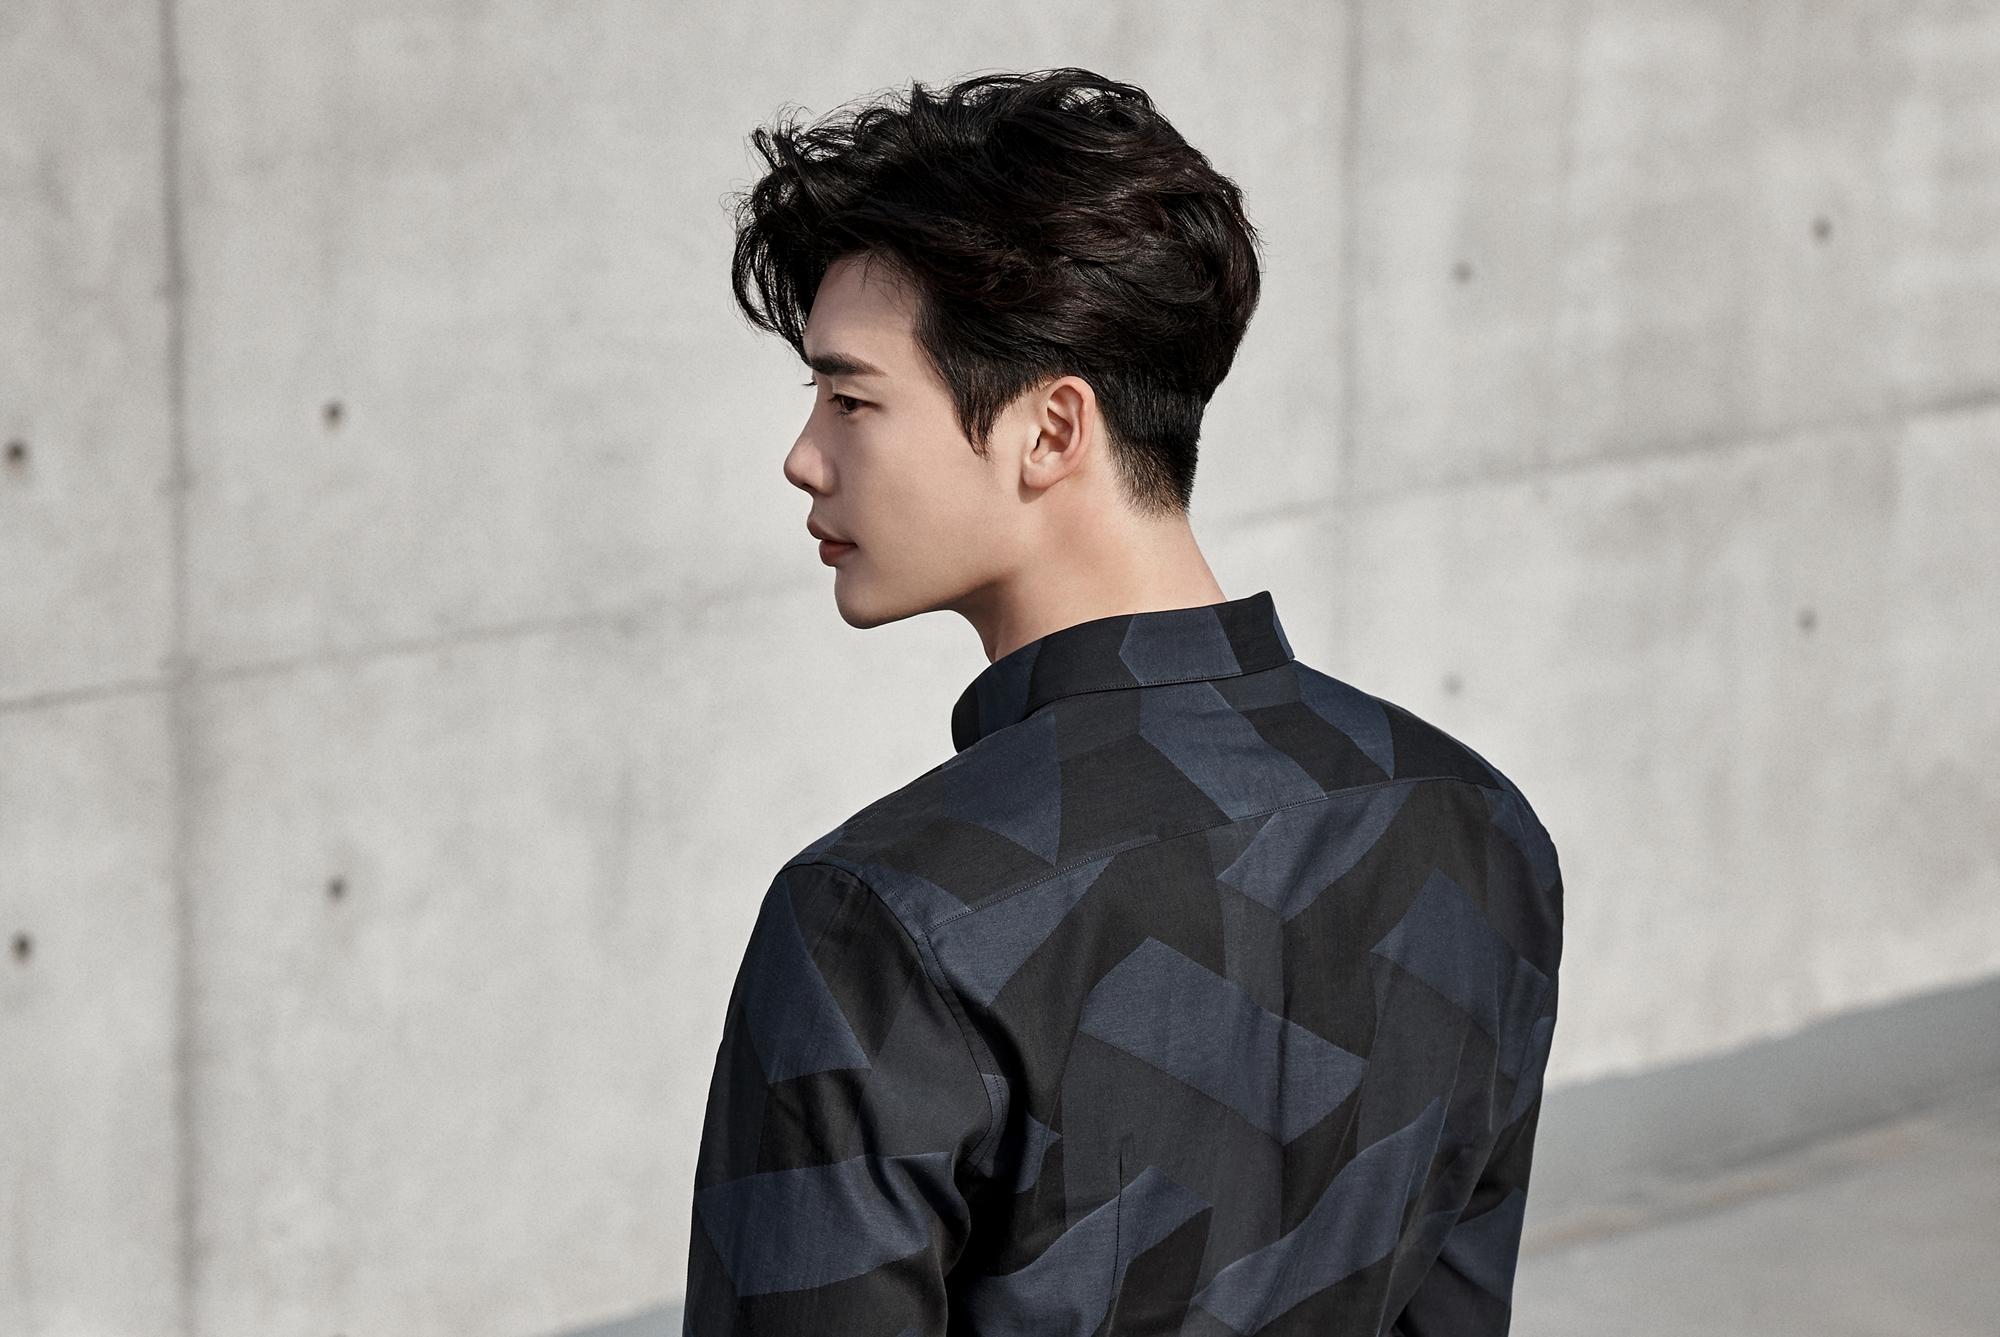 Lee Jong Suk K Drama Asiachan Kpop Image Board